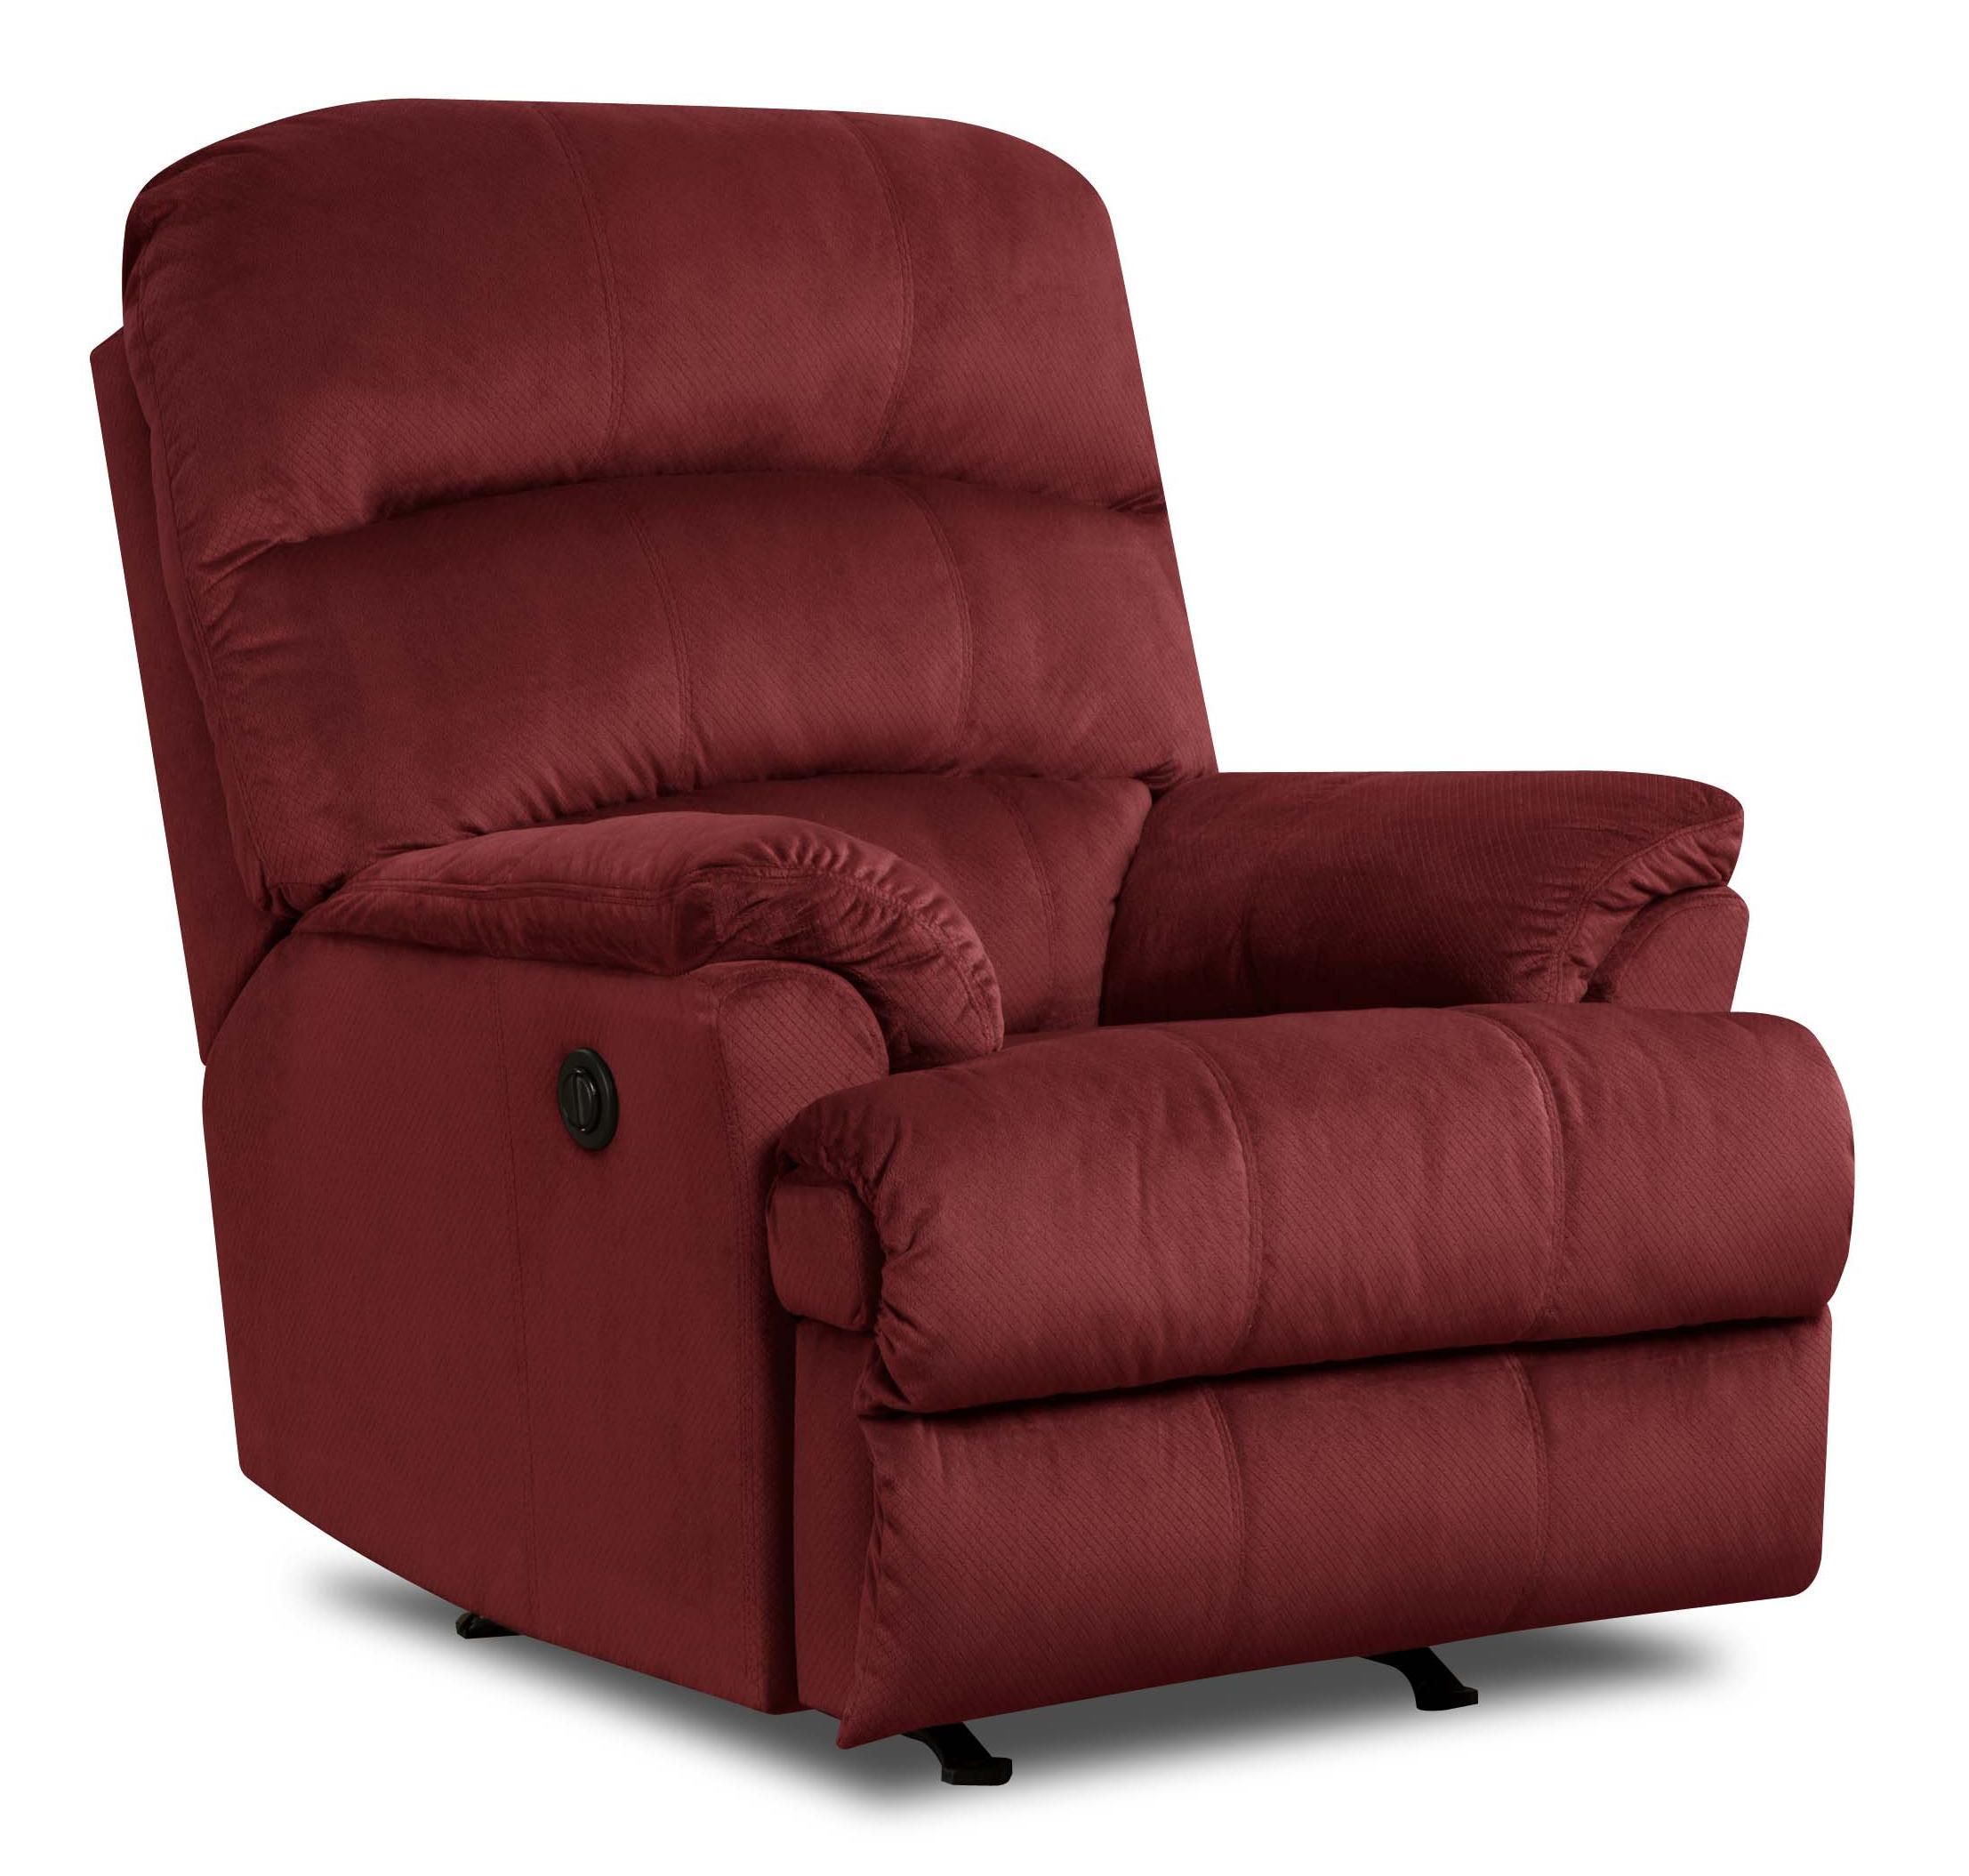 United Furniture Industries 271 Casual Rocker Recliner - Item Number: 271 Rocker Recliner Merlot